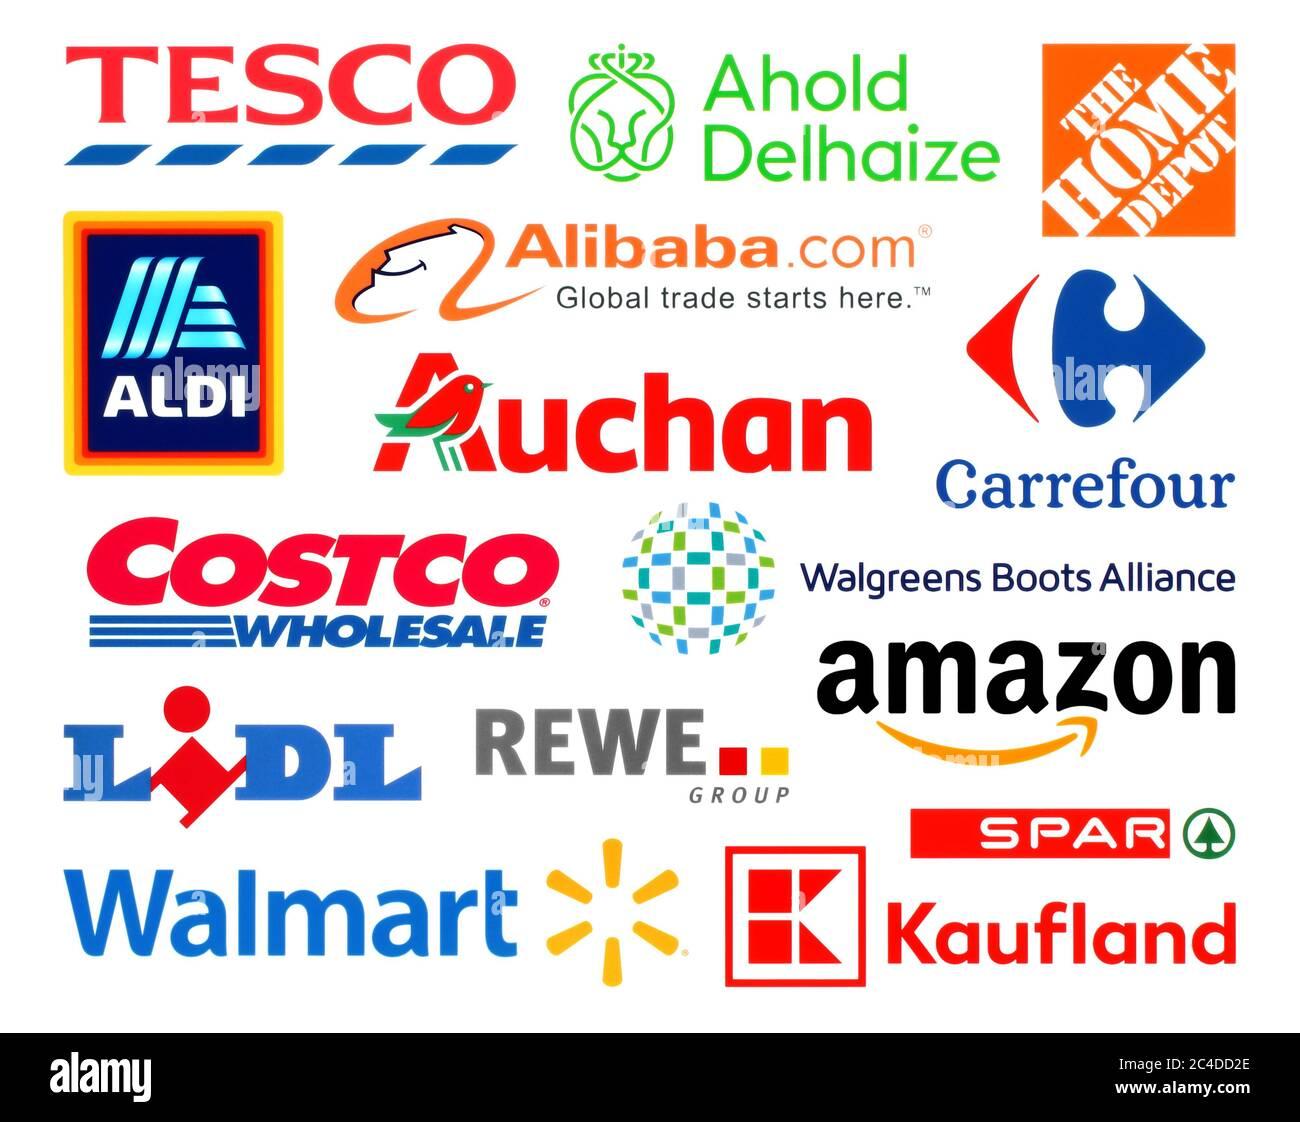 Kiev, Ukraine - February 23, 2020: Logos collection of the biggest world retails, such as: Amazon, Tesco, Alibaba, Lidl, Walmart, Aldi, Auchan, and ot Stock Photo